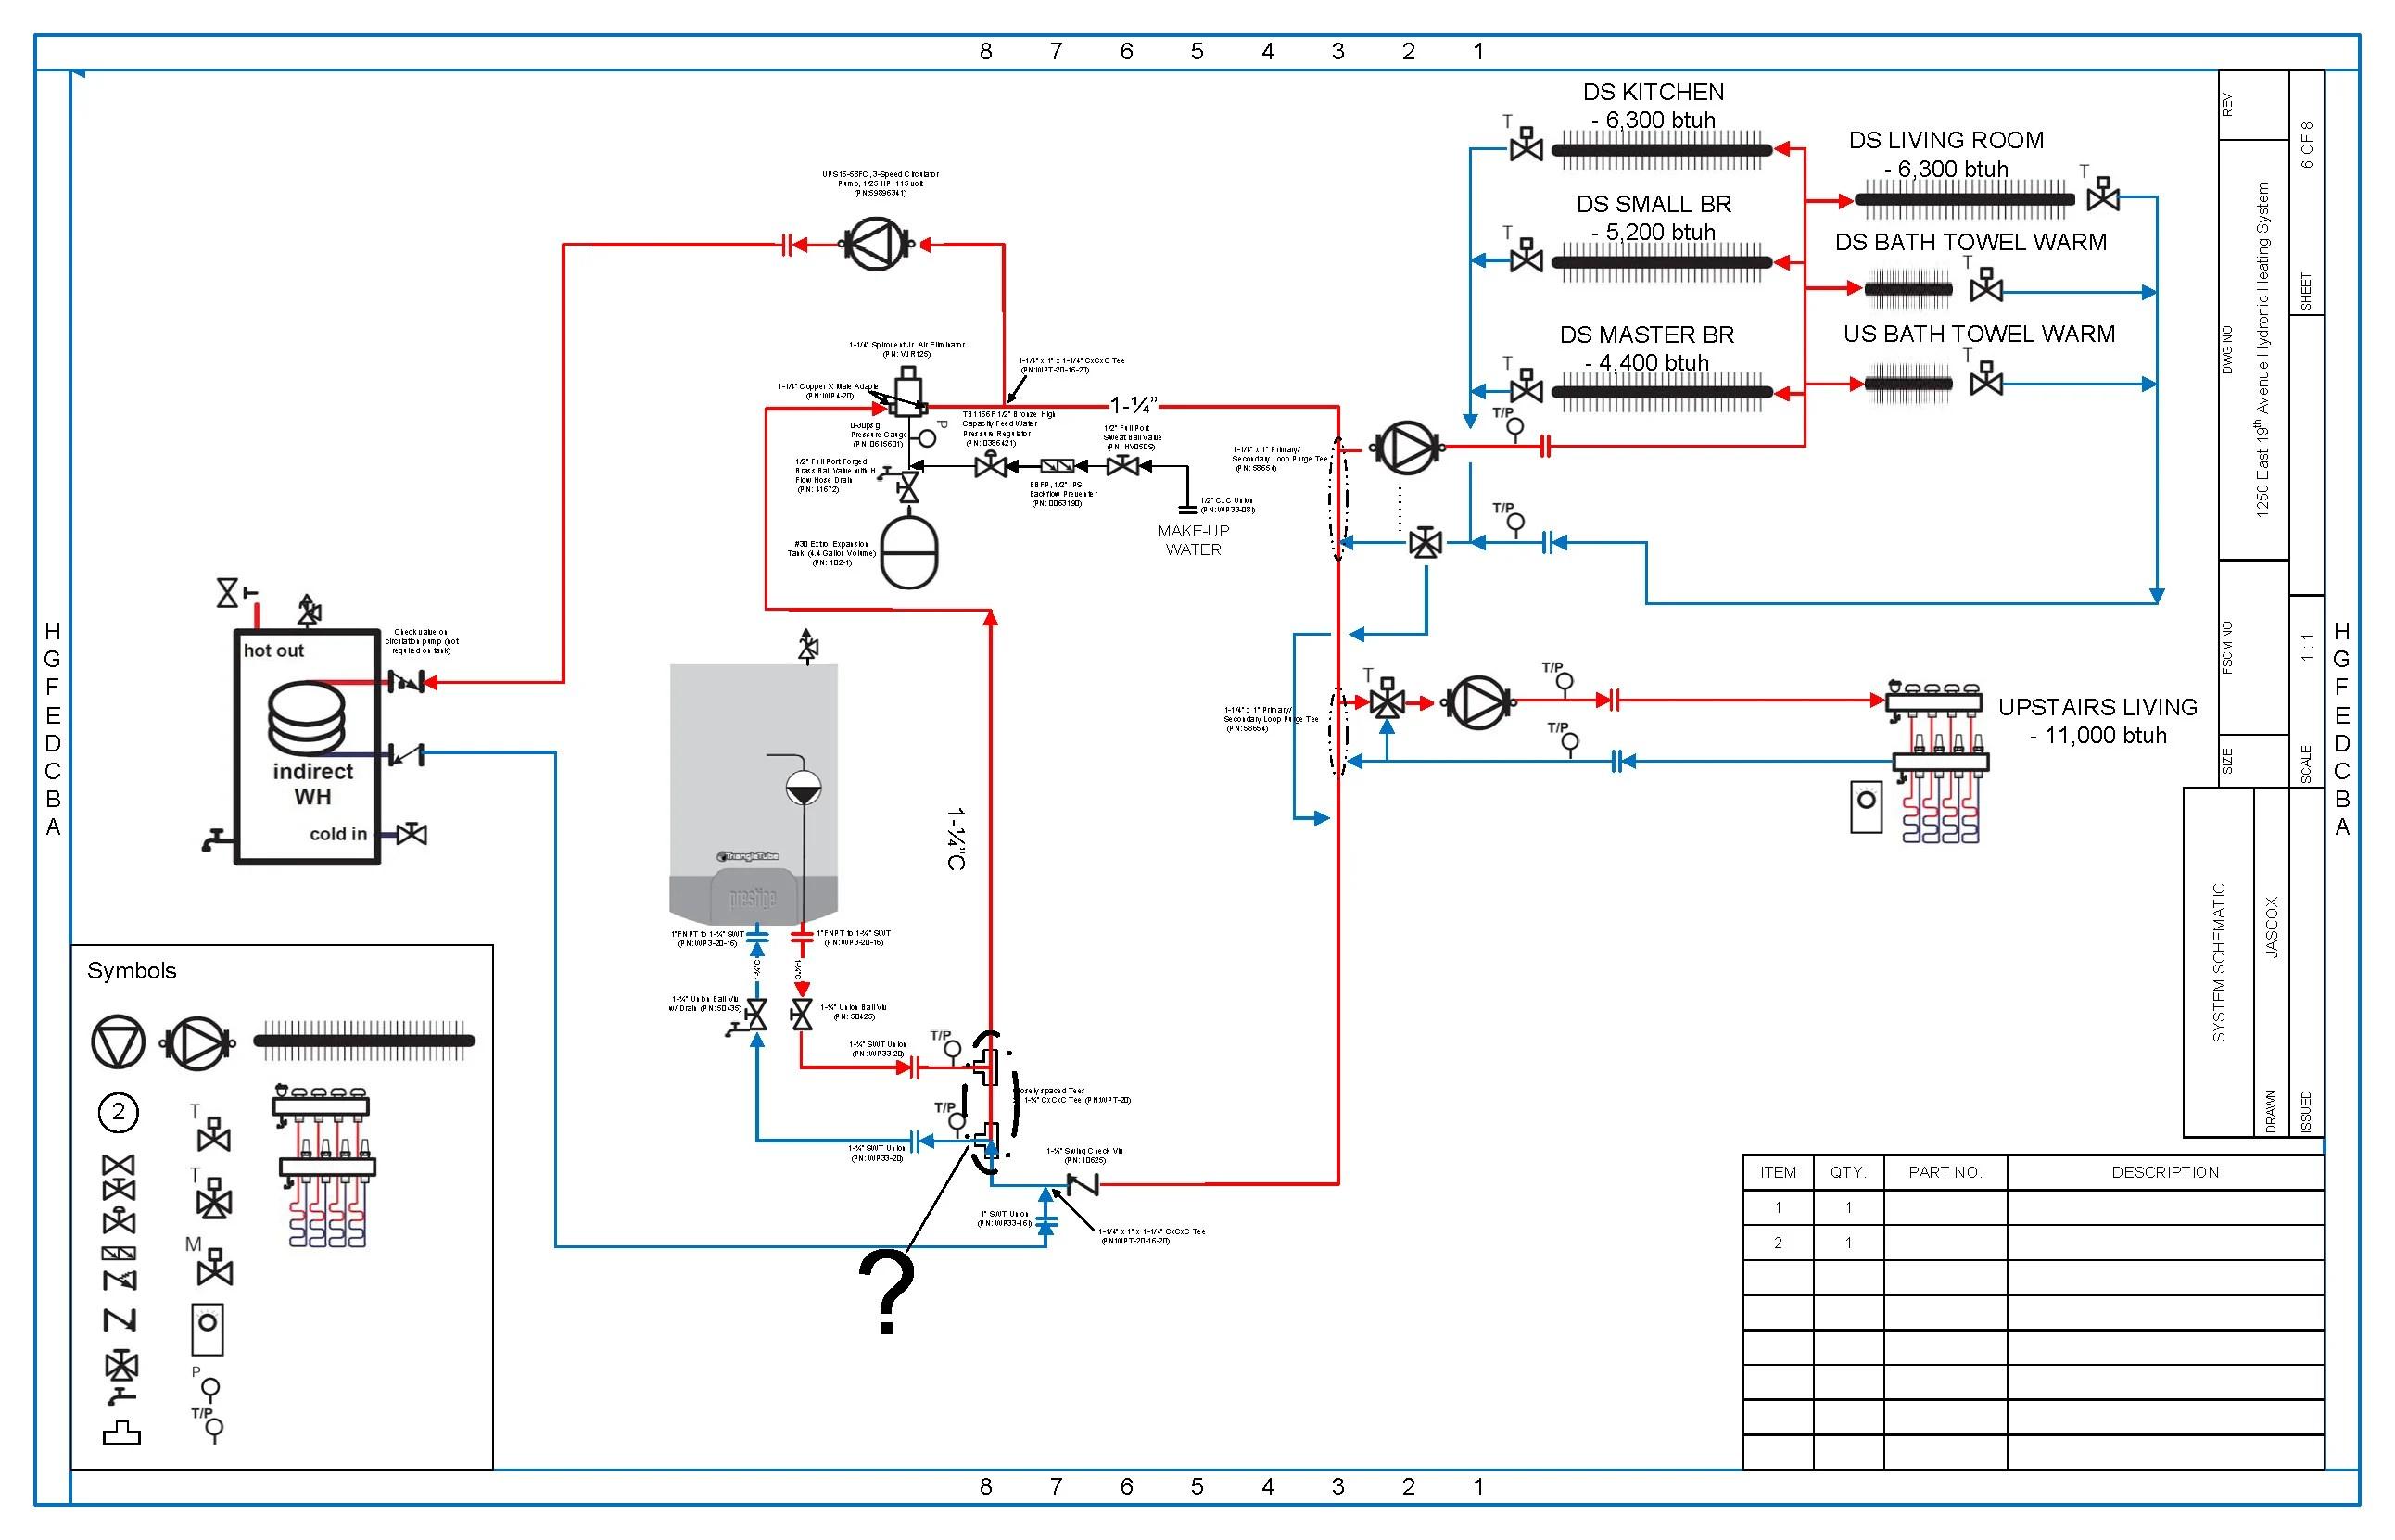 20101031Hydronic Heating Schematic?resize\\=665%2C428\\&ssl\\=1 100 [ honeywell pipe thermostat wiring diagram ] honeywell Honeywell Thermostat Wiring Diagram at suagrazia.org